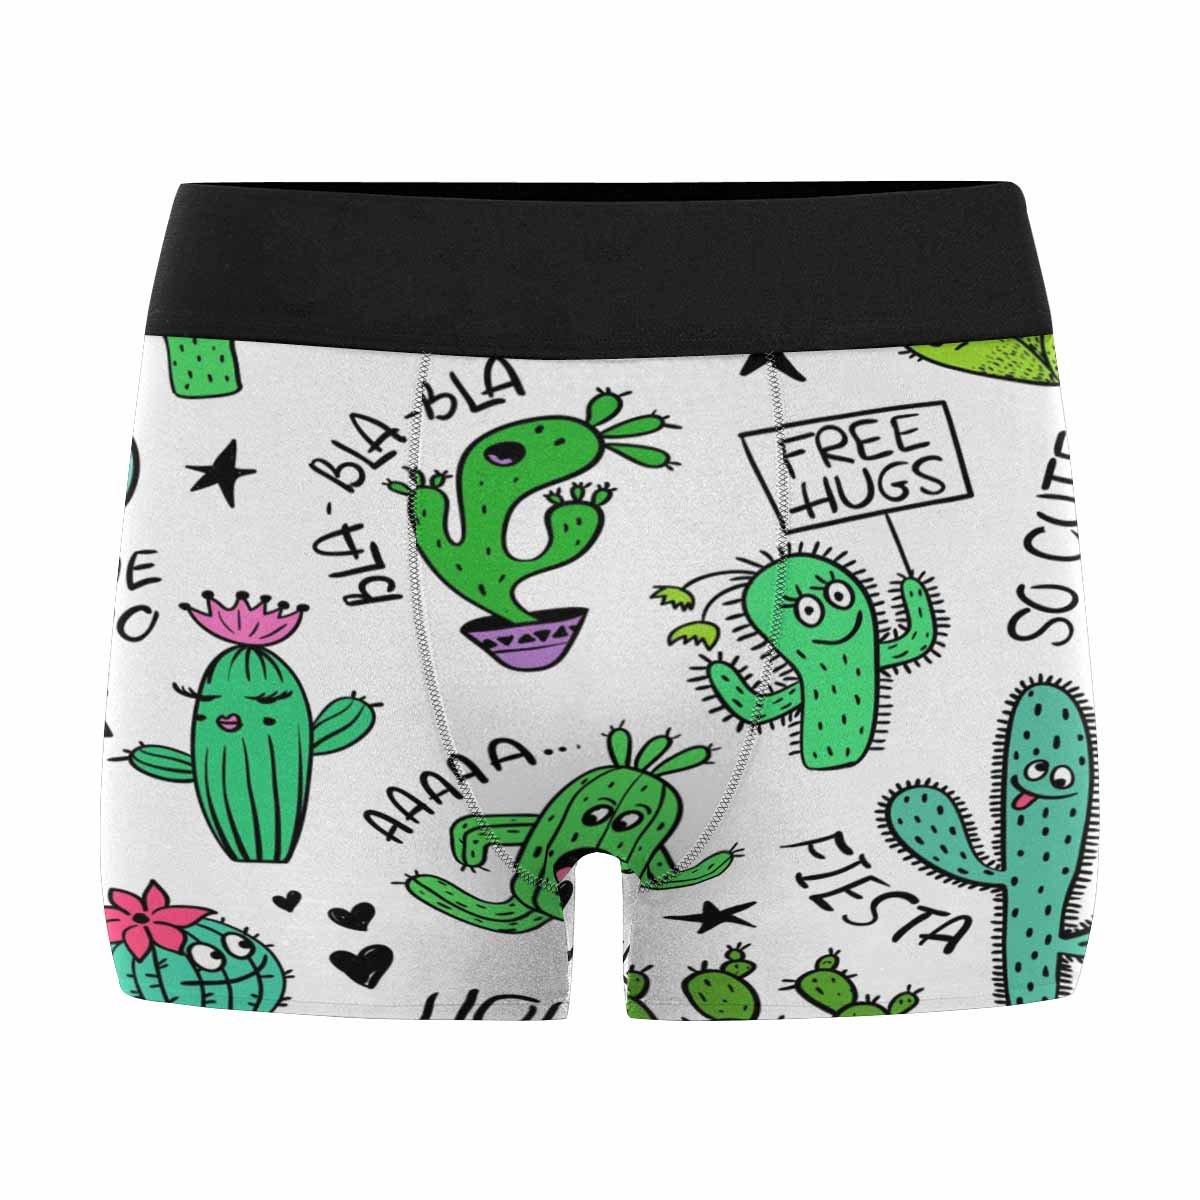 XS-3XL INTERESTPRINT Boxer Briefs Mens Underwear Tropical Fruits and Ice Cream Memphis Style